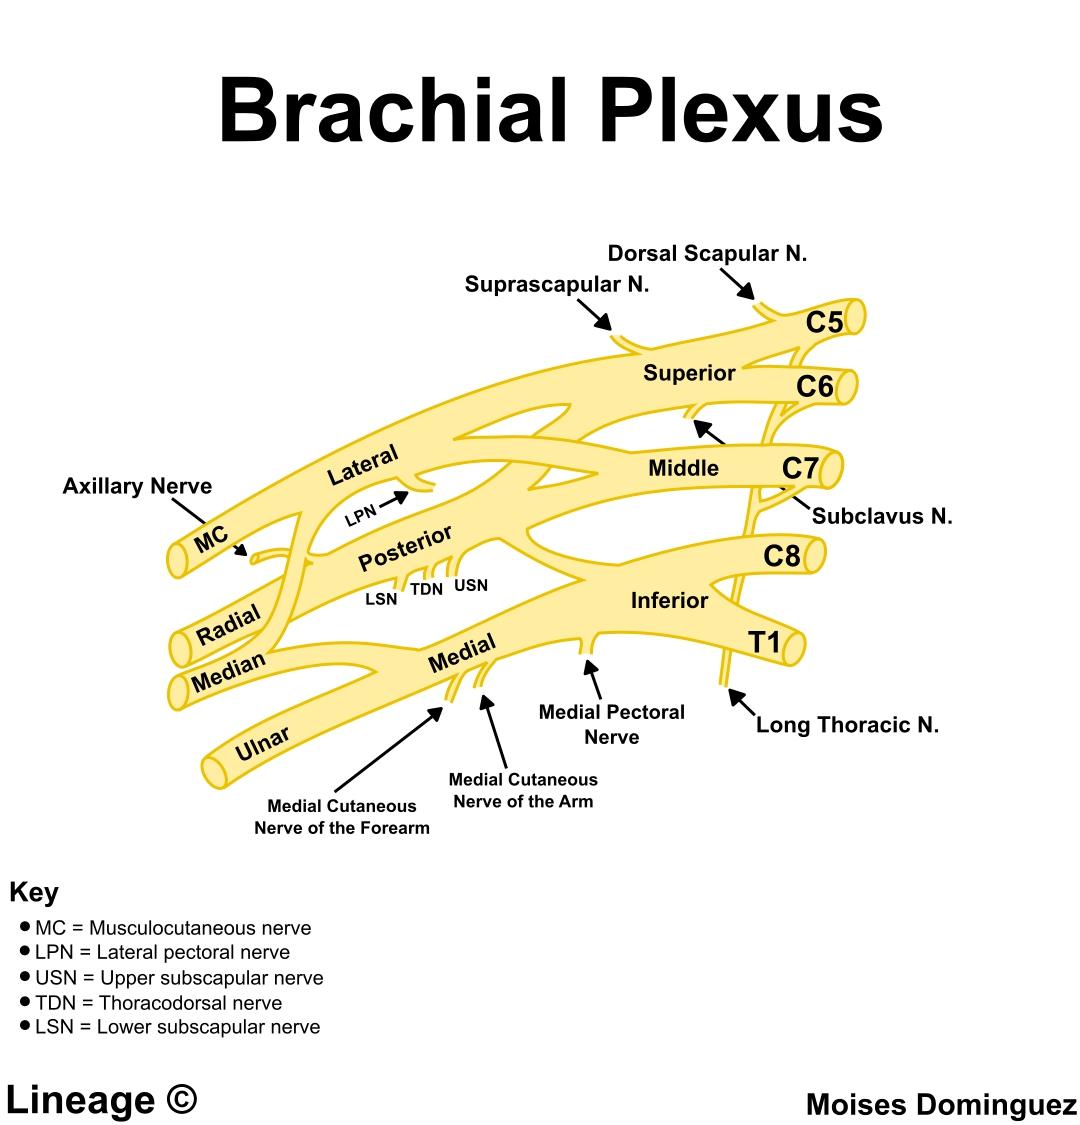 Brachial Plexus Lesions Msk Medbullets Step 1